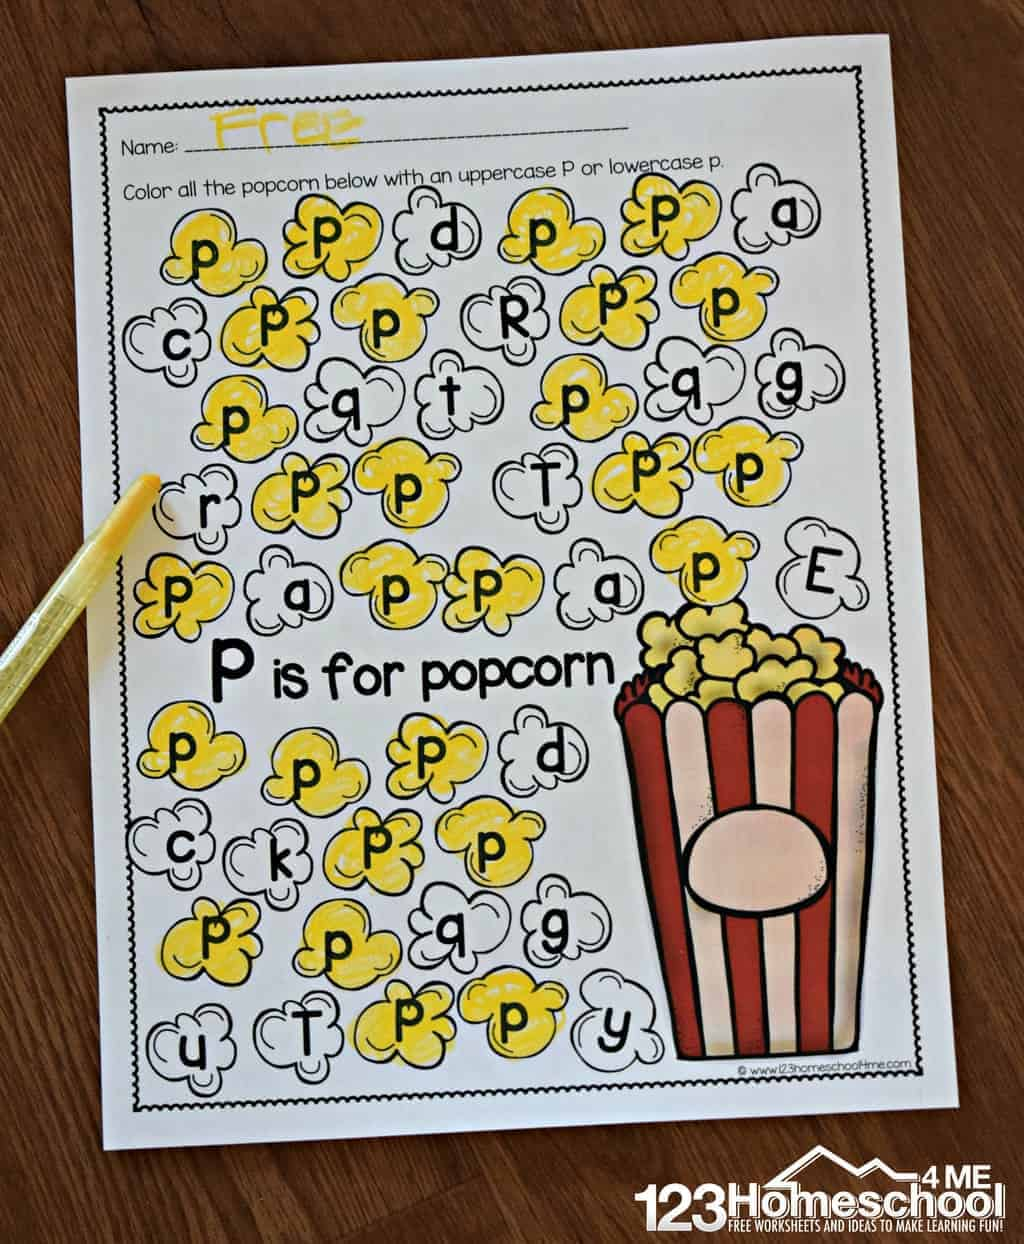 Free A To Z Letter Find Worksheets intended for Alphabet Recognition Worksheets For Preschool